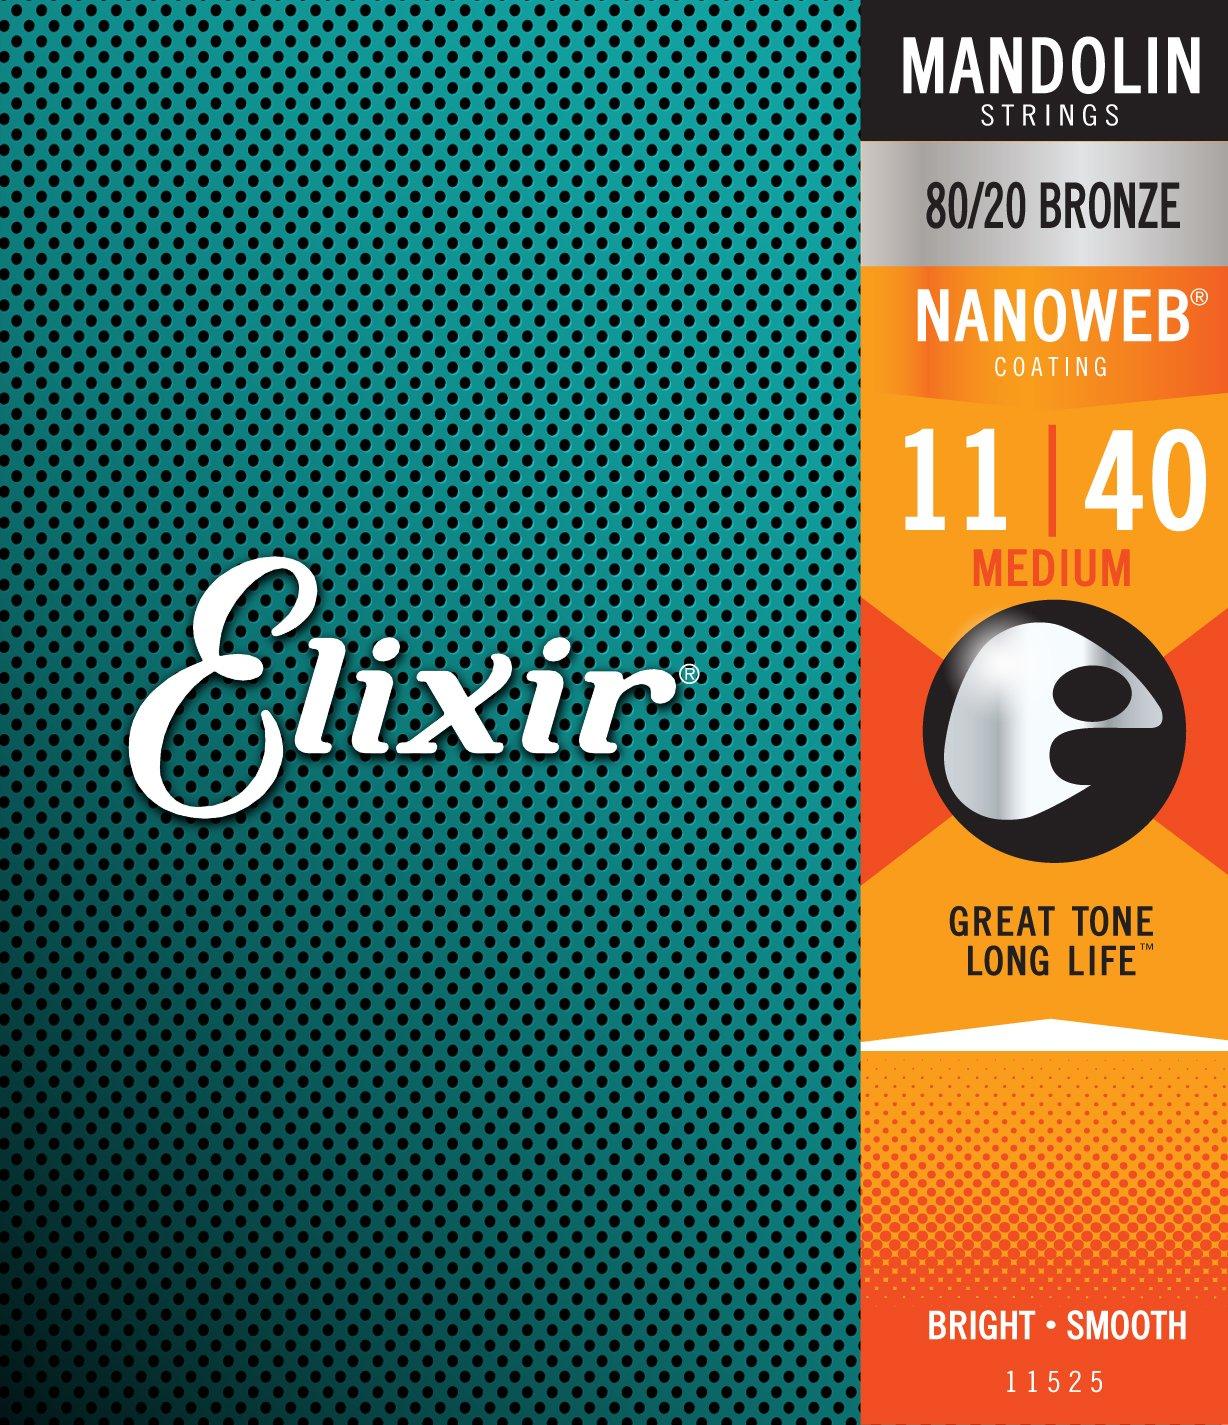 Elixir Strings Mandolin Strings w NANOWEB Coating, Medium (.011-.040) W.L. Gore & Associates Inc. 11525